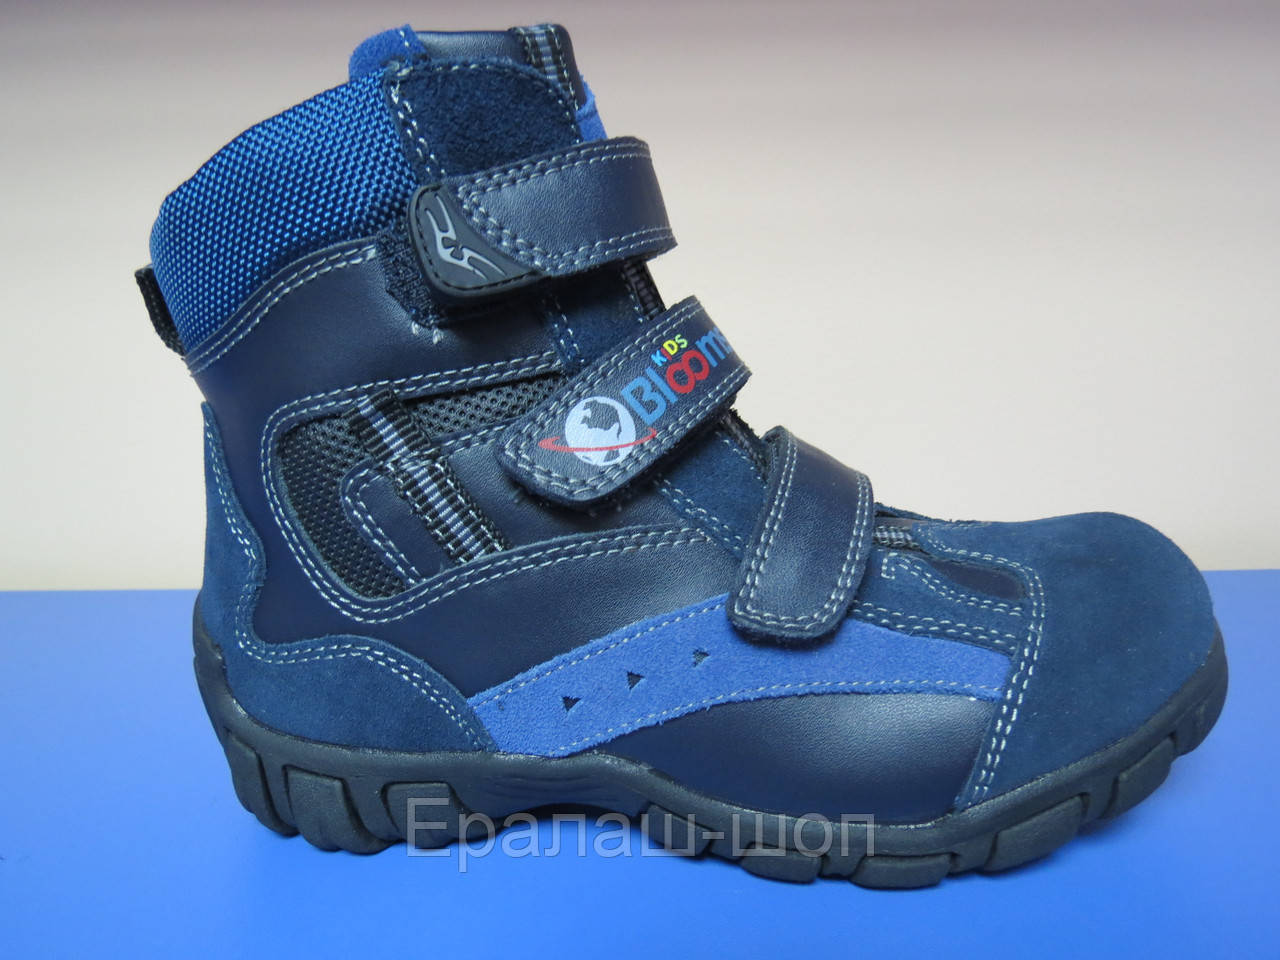 37578b749 Распродажа!Зимние ботинки для мальчика тм Bloom 30р-36р - Ералаш-шоп в